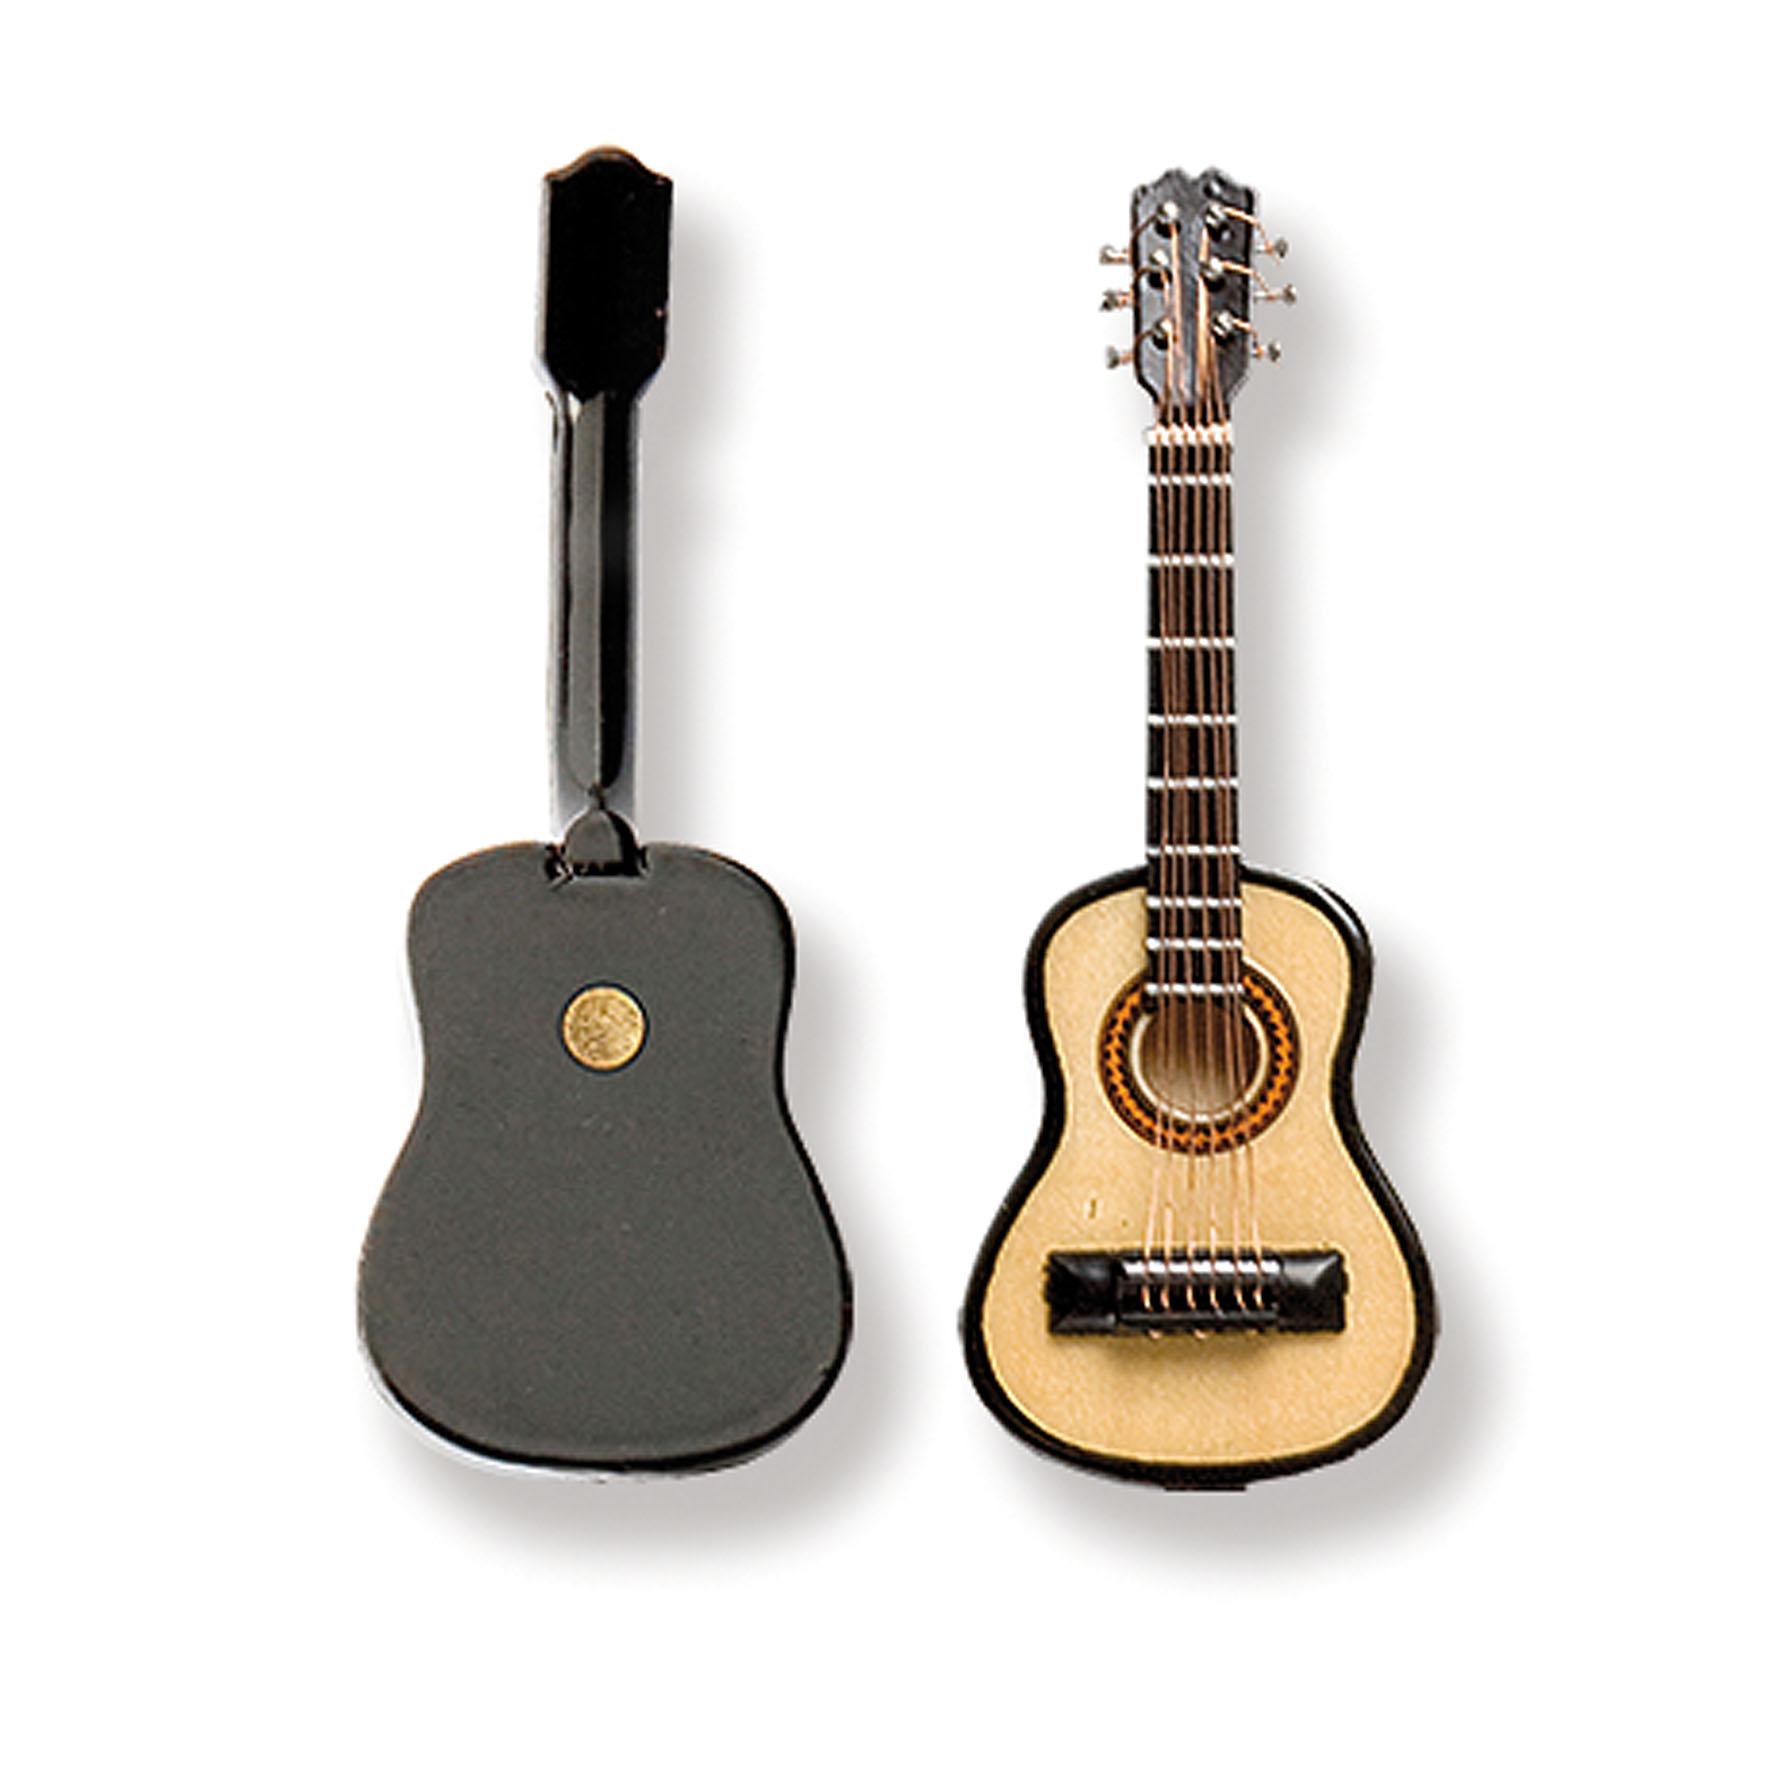 Miniatur-Gitarre mit Magnet